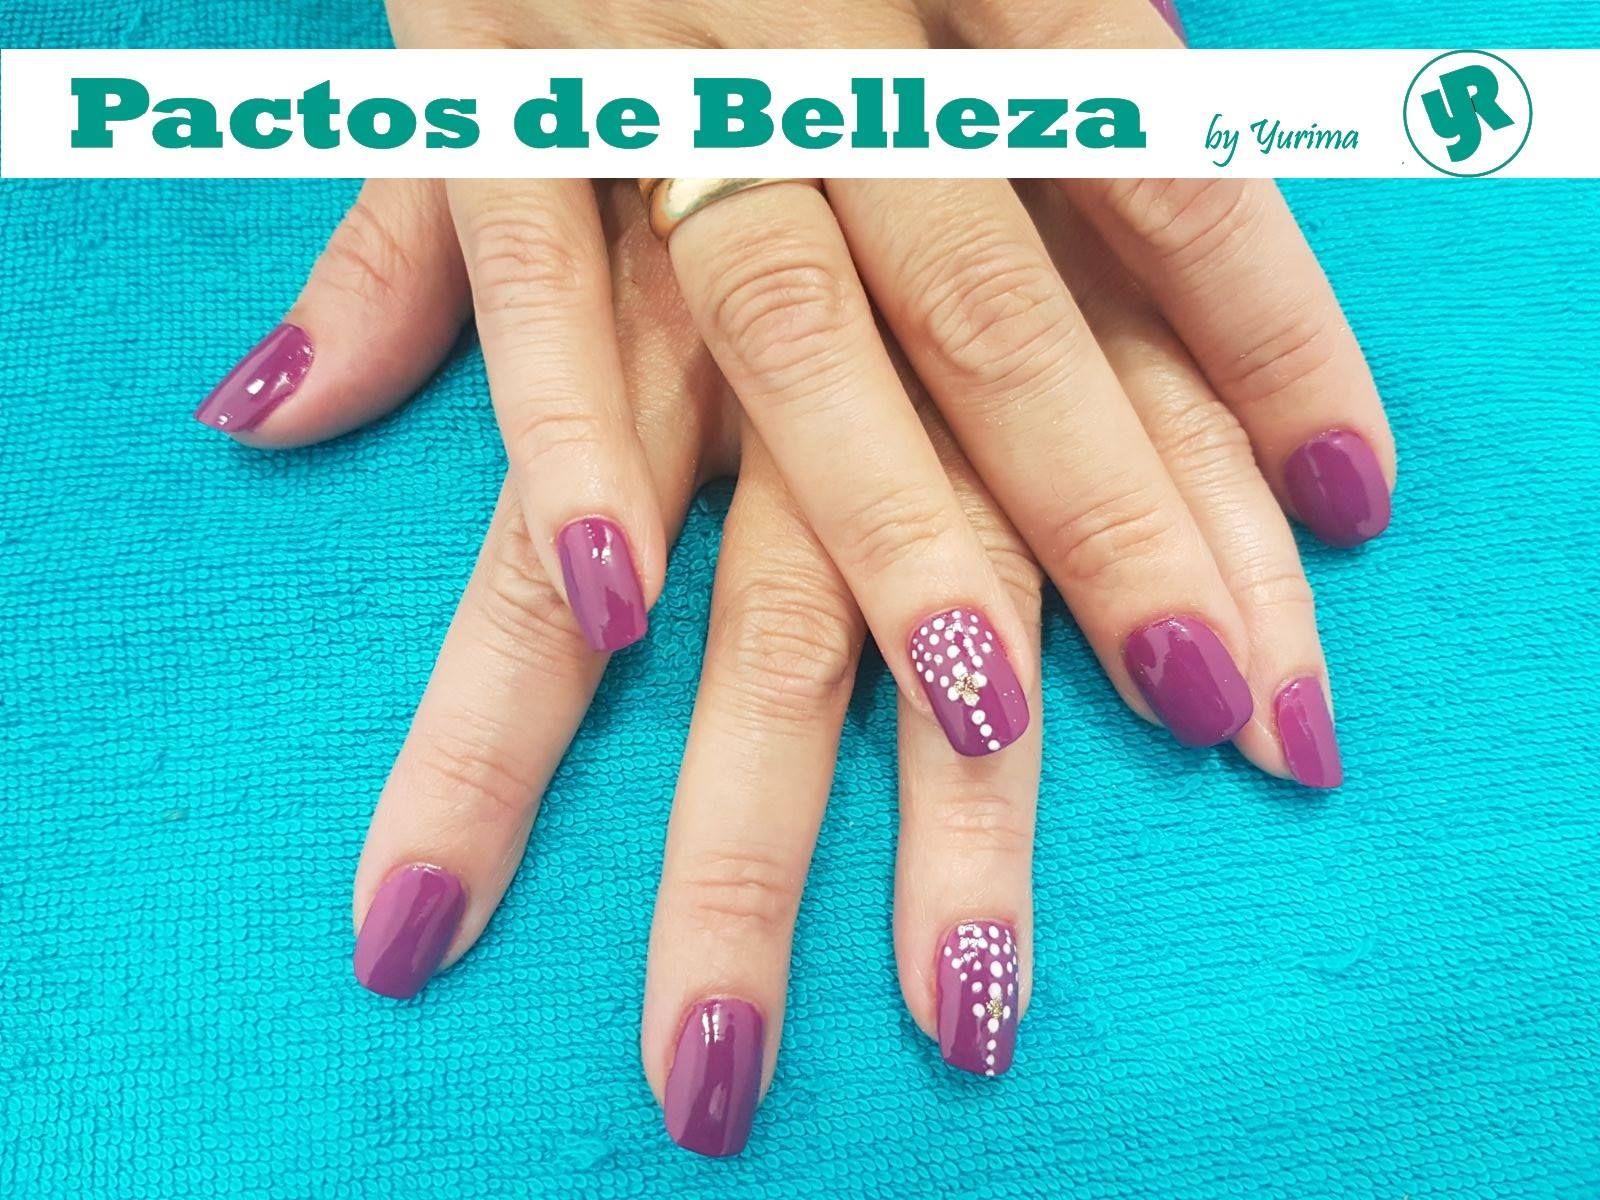 Foto 19 de Centros de estética en  | Pactos de Belleza